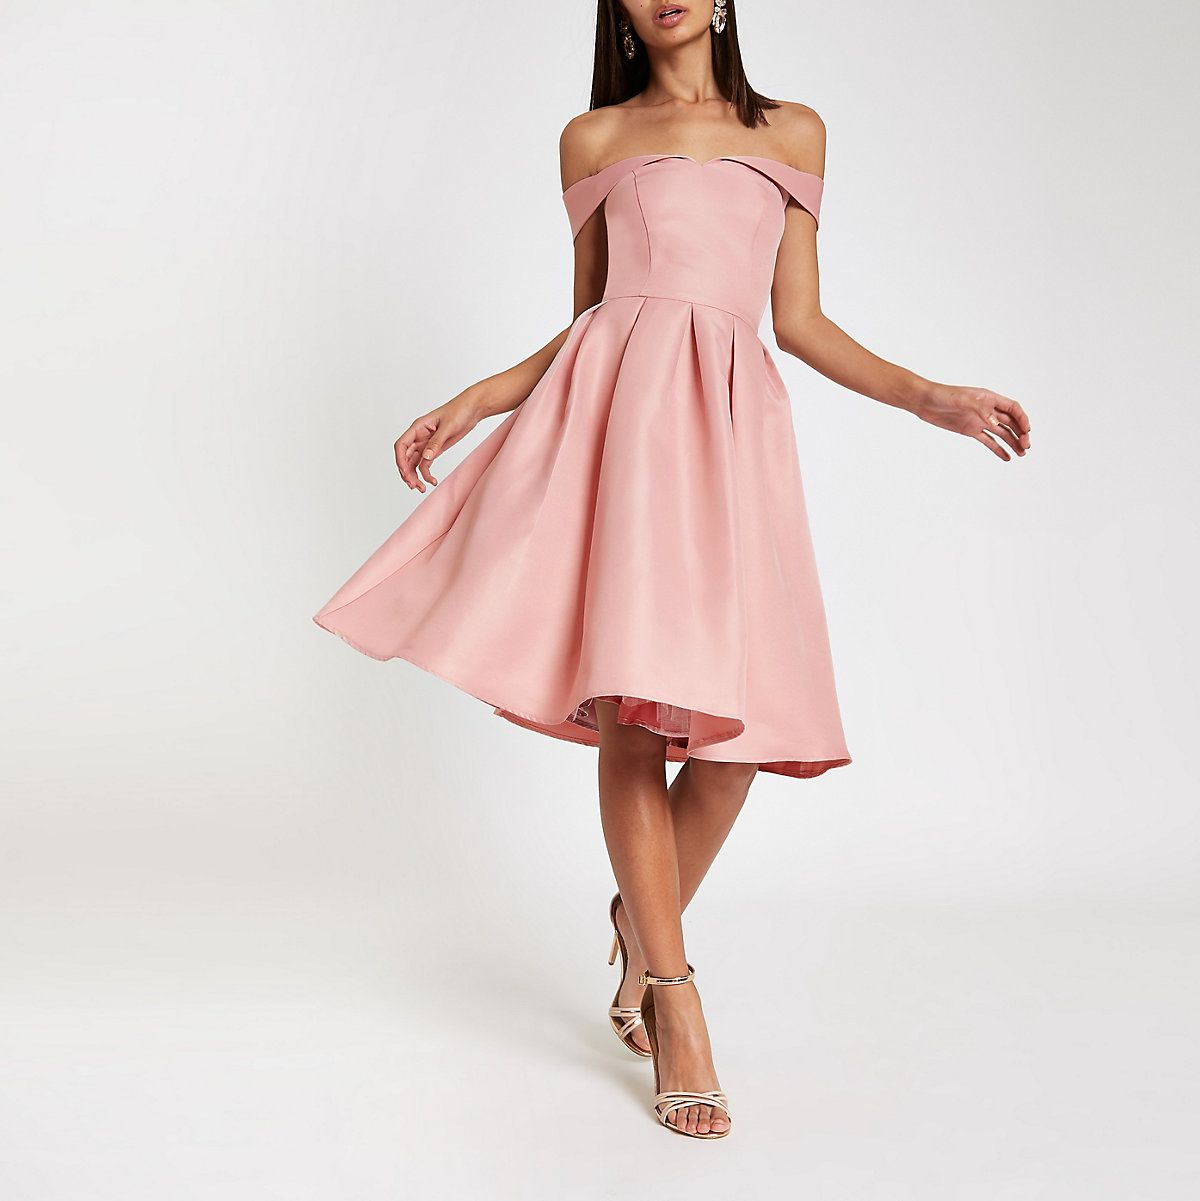 Chi Chi London pink bardot neck prom dress Catherineus Wedding